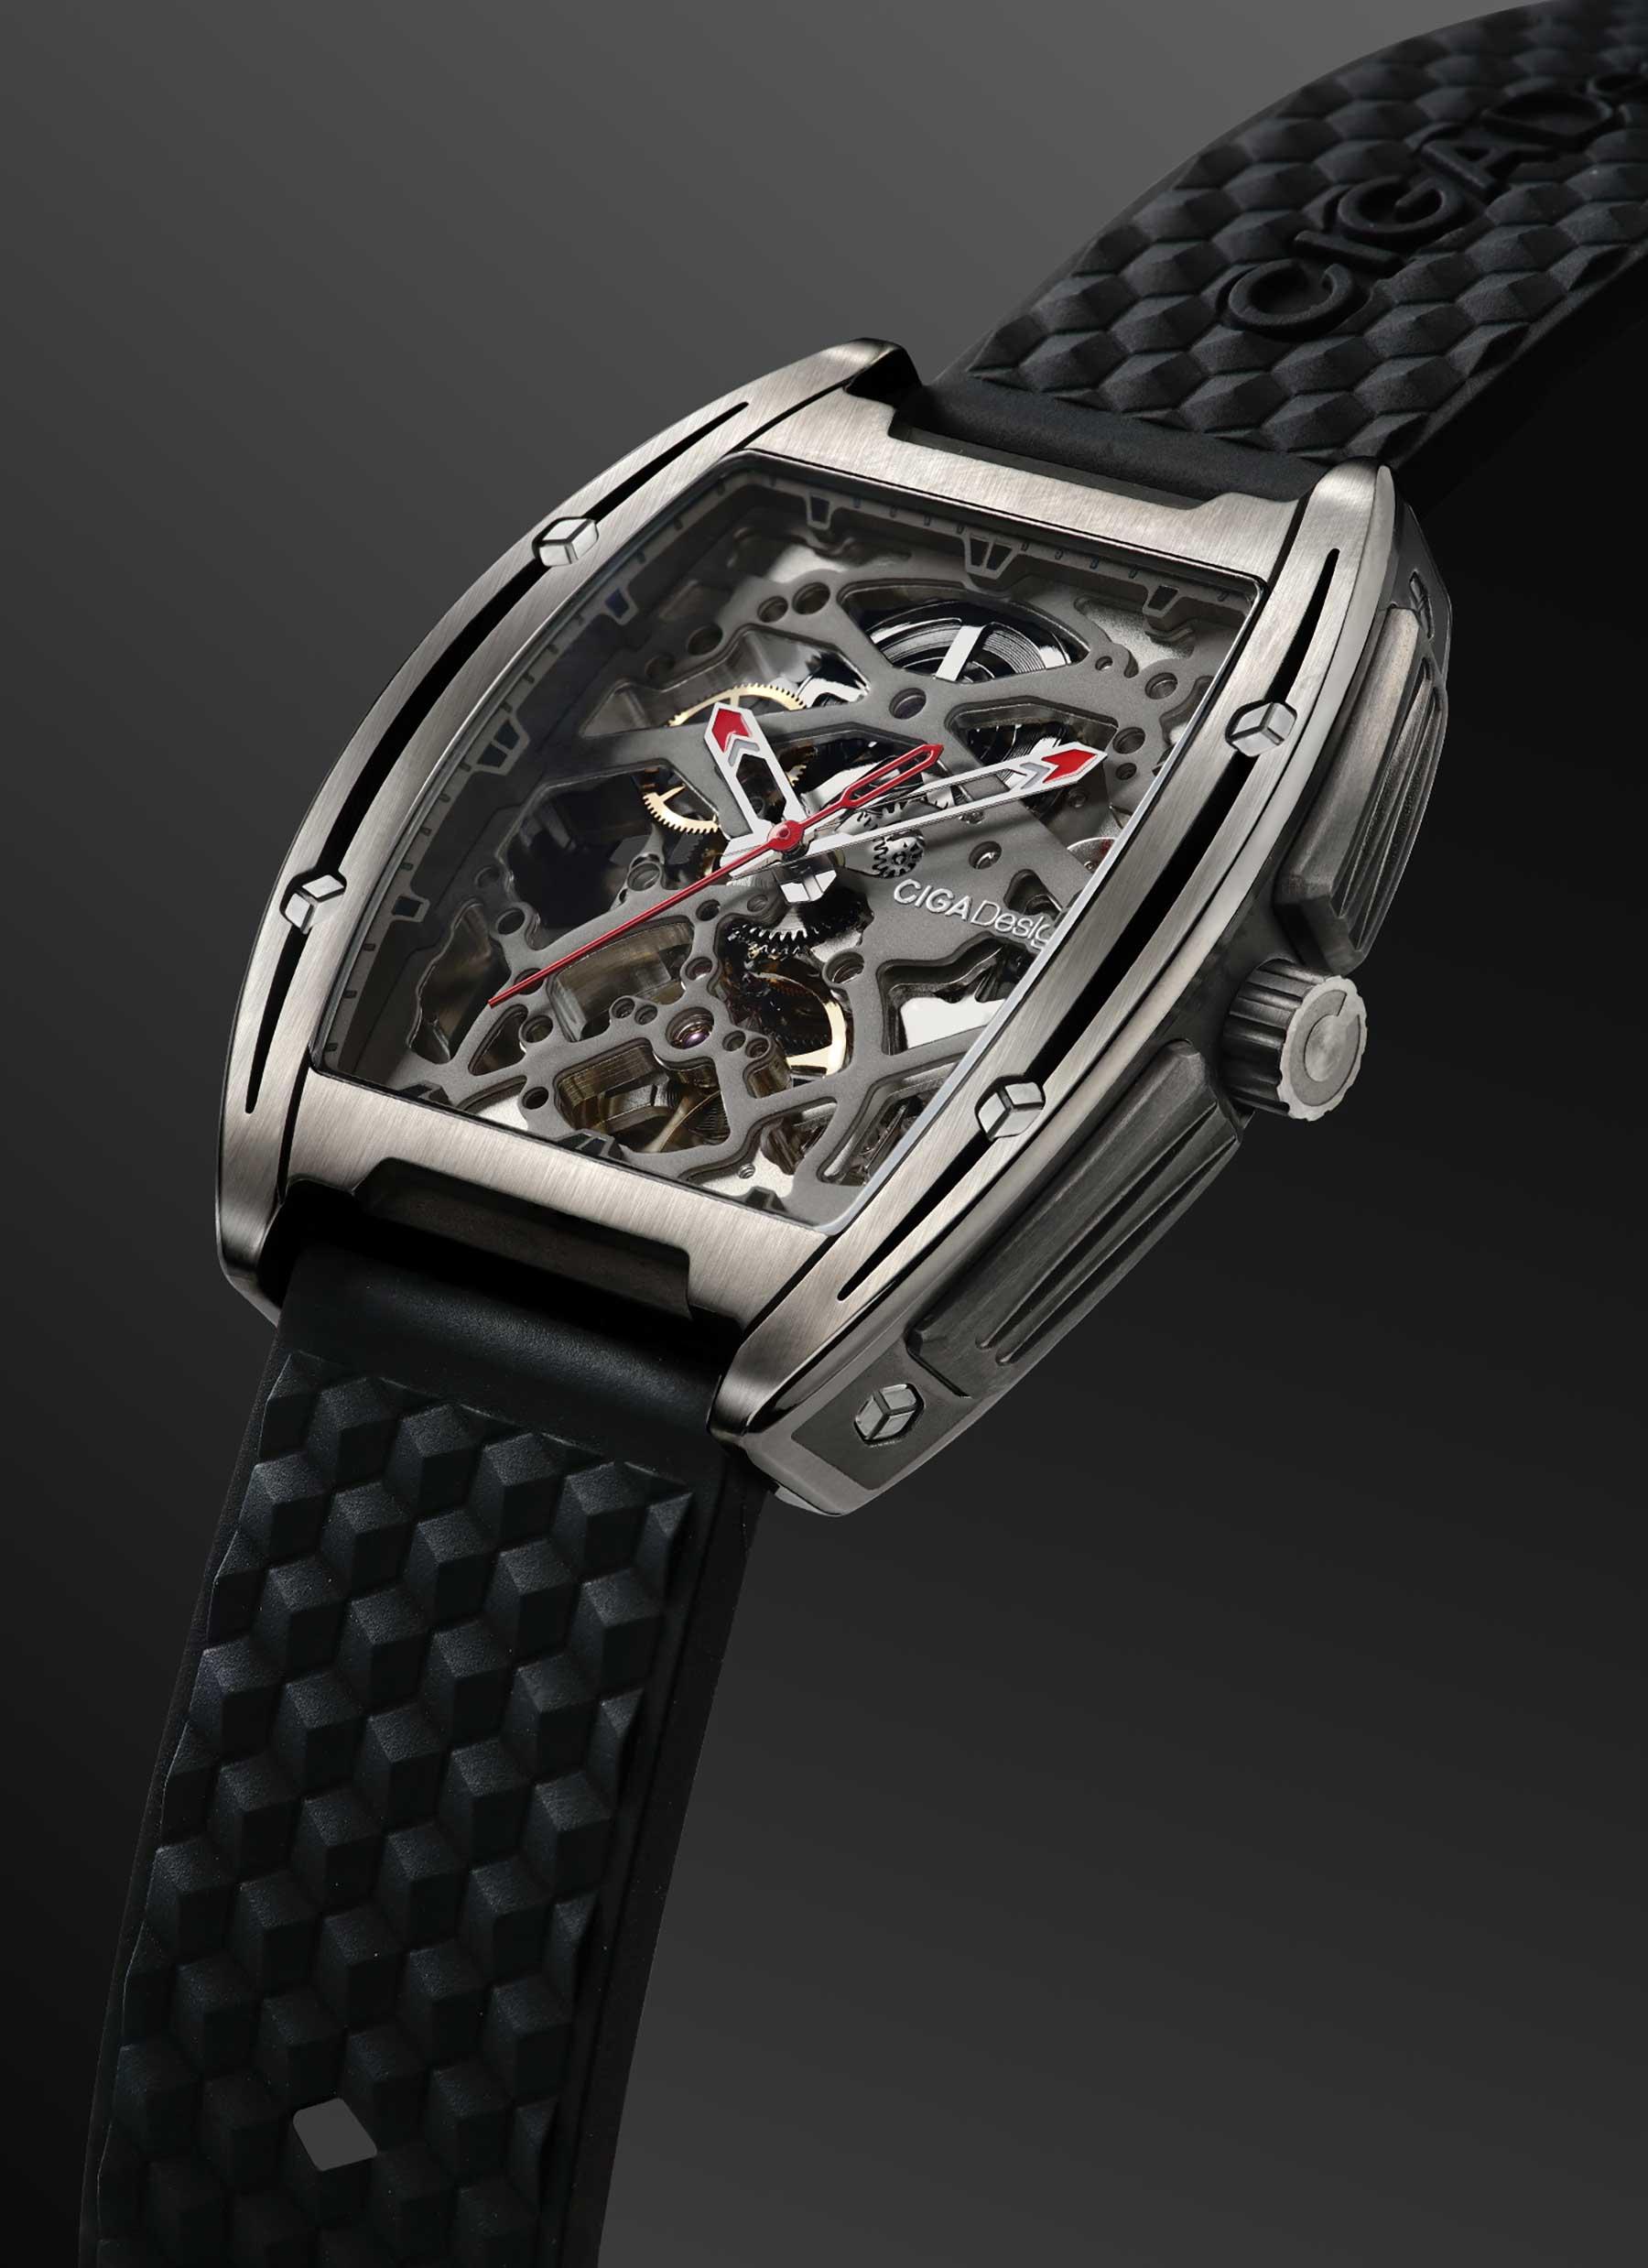 Starkes Design: CIGA Design Z-Series mechanische Titan-Armbanduhr CIGA-Design-Z-Series-armbanduhr-crowdfunding_02